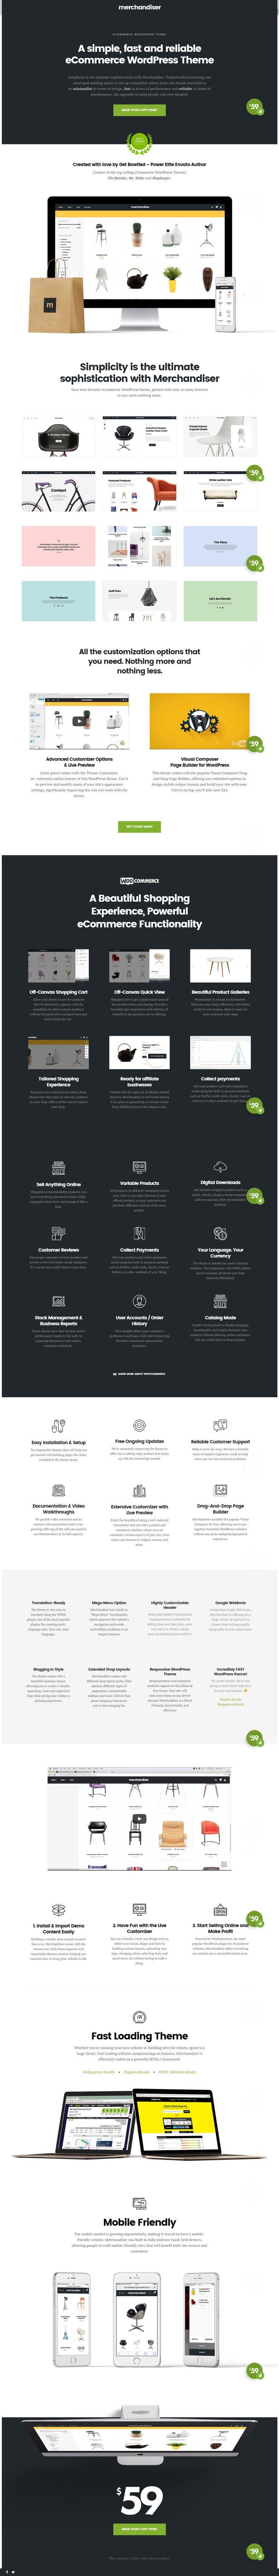 Meet Merchandiser, the best newcomer WordPress eCommerce theme of 2016! http://themeforest.net/item/merchandiser-ecommerce-wordpress-theme-for-woocommerce/15791151 #ecommerce #design #minimalism #wordpress #templates #themes #webdesign